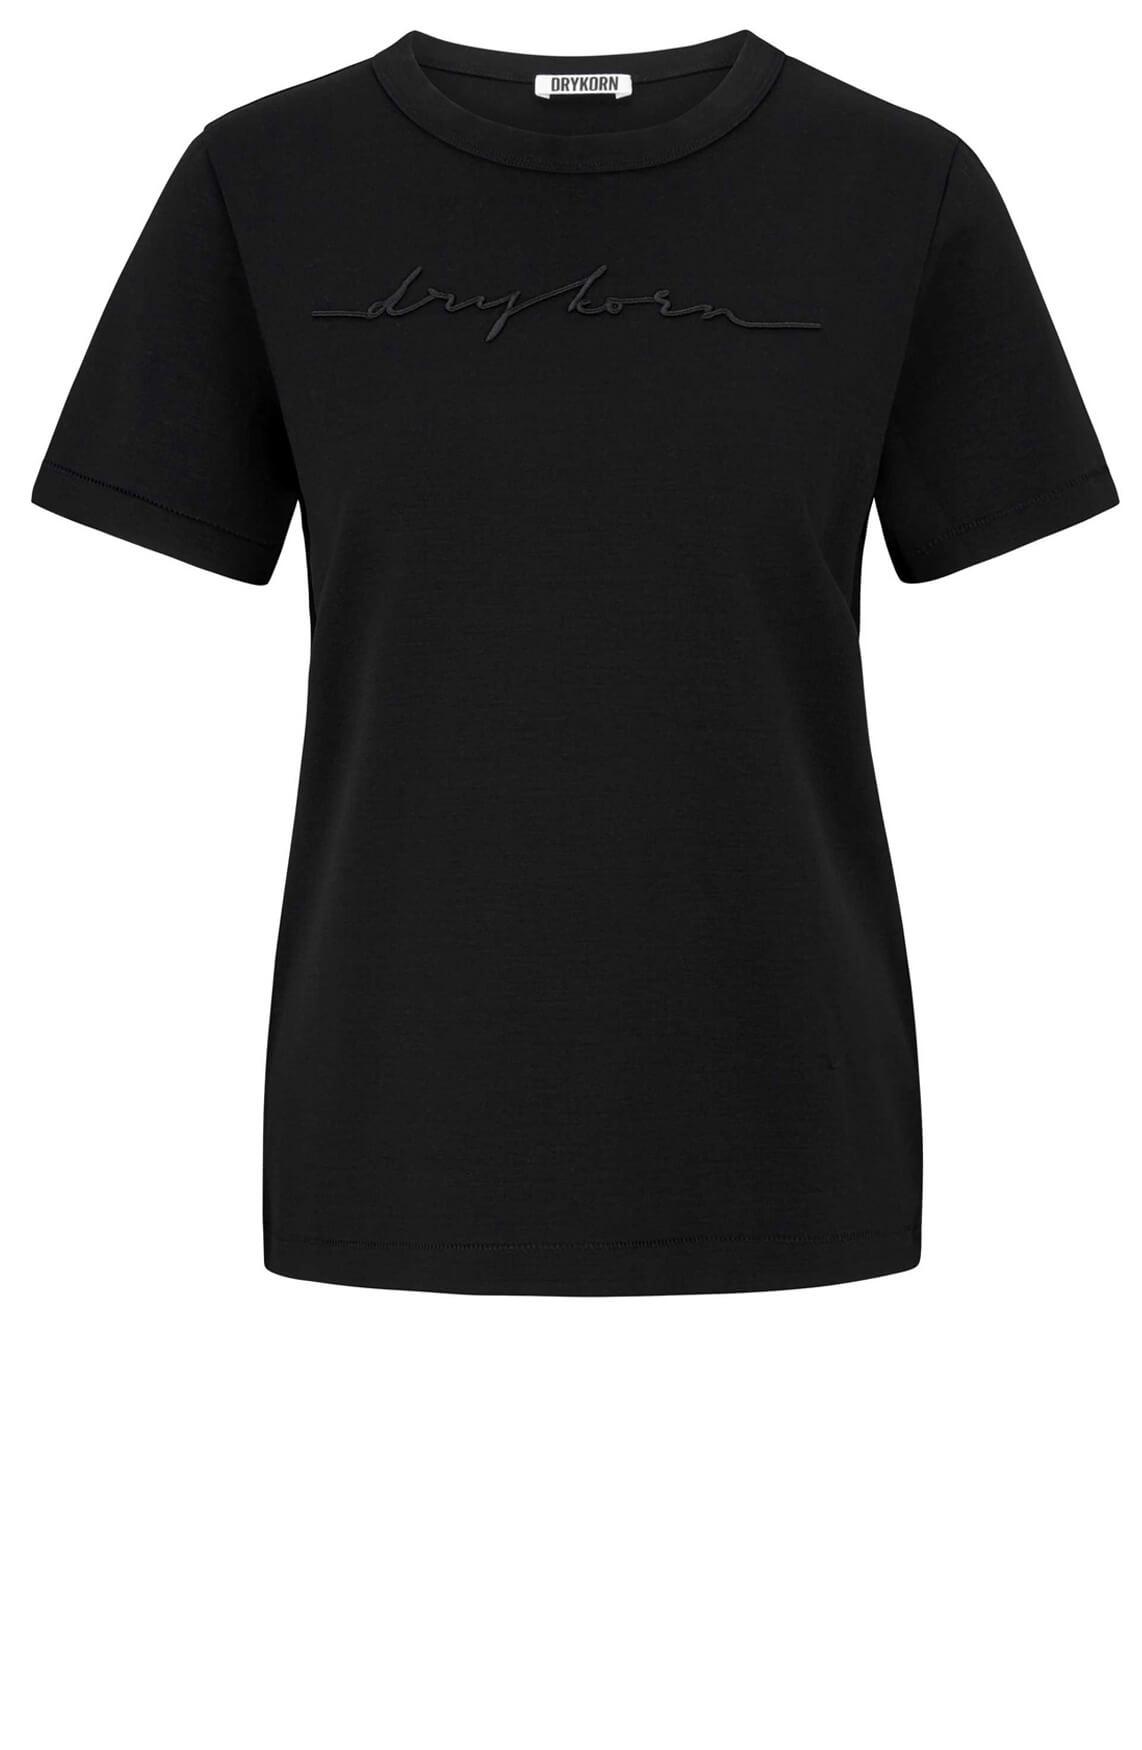 Drykorn Dames Anisia embroidery shirt zwart